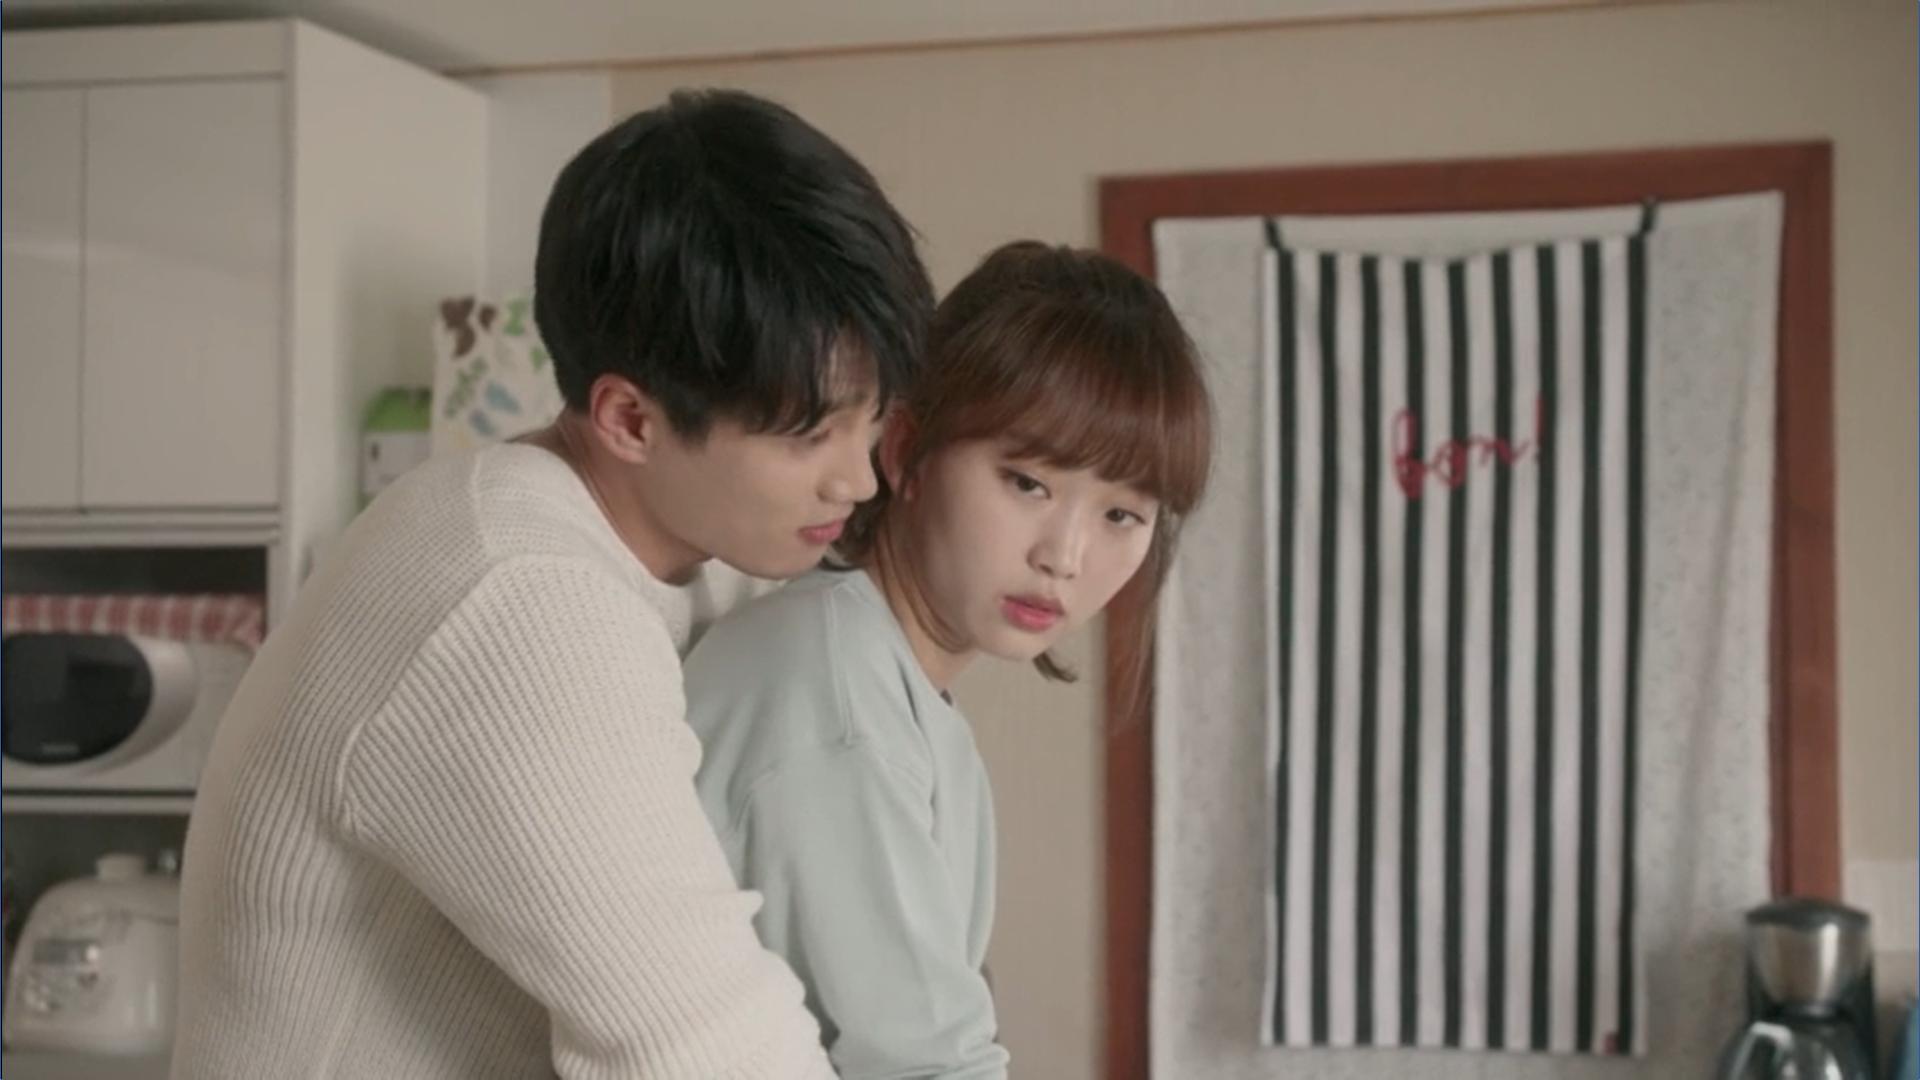 Wednesday 3:30 PM Seon Eun-woo seeing Baek Seung-gyu hugging